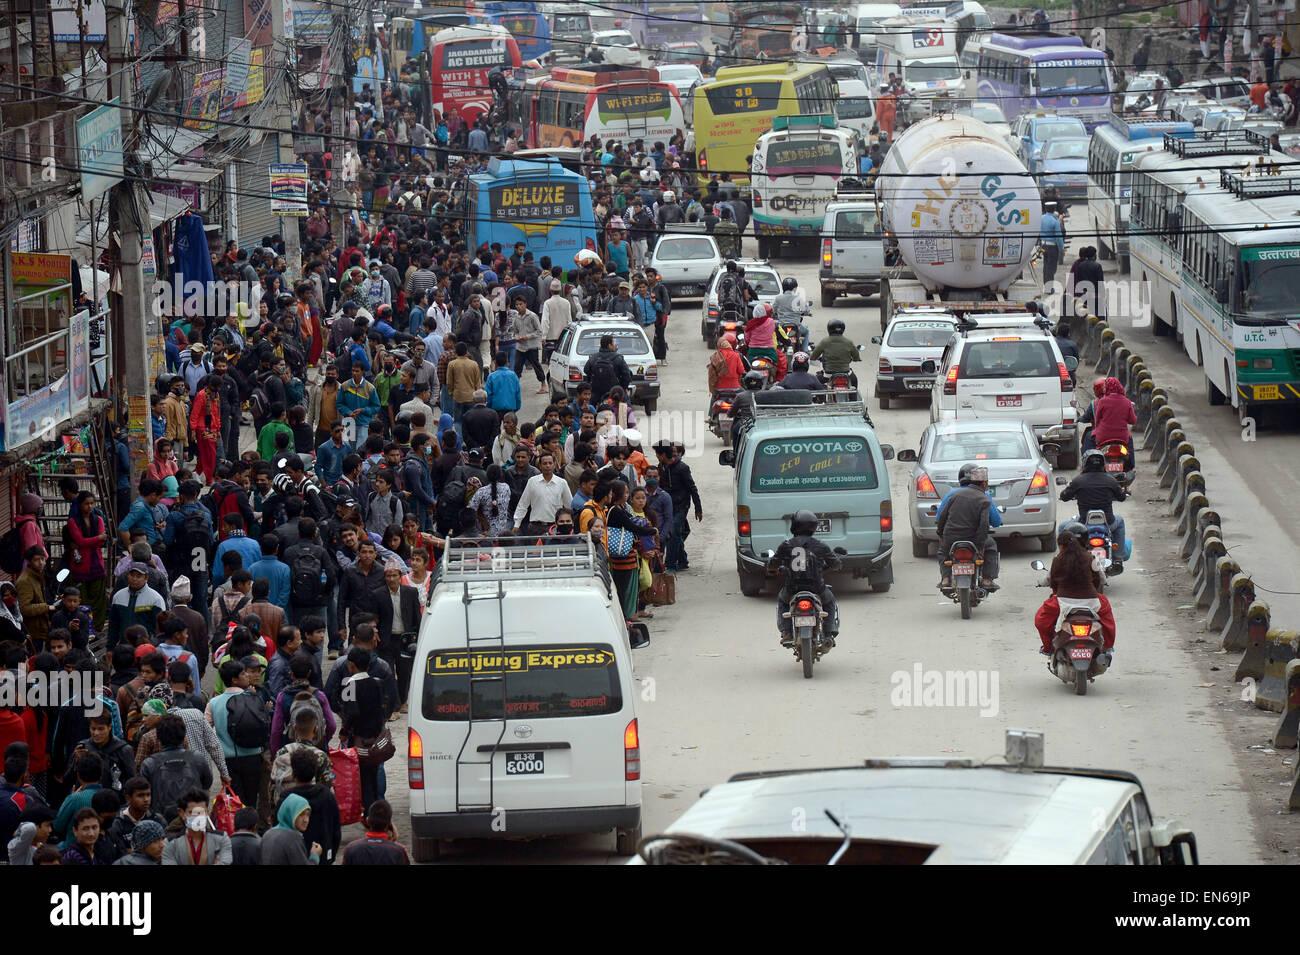 Kathmandu, Nepal. 28th Apr, 2015. People wait for public transport at Kalanki Chowk in Kathmandu, Nepal, 28 April - Stock Image